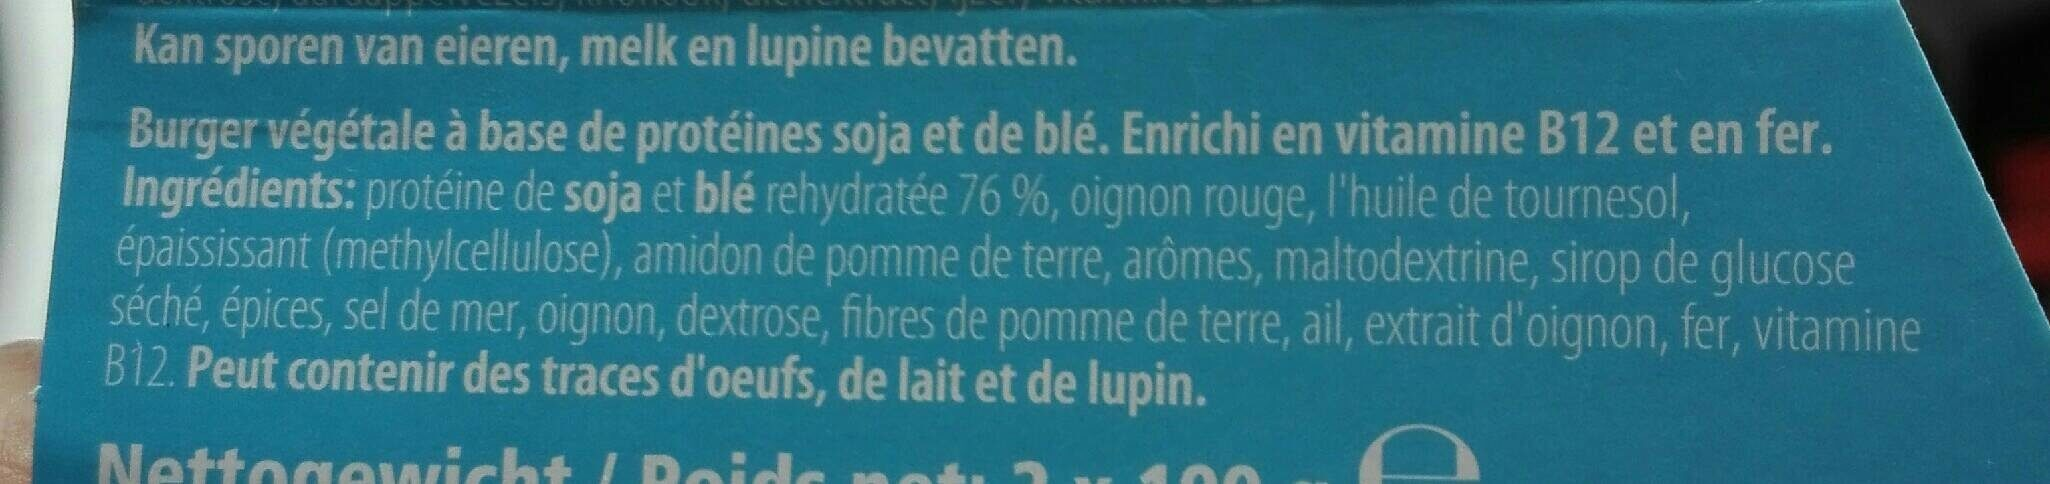 Soy pro boulette - Ingredients